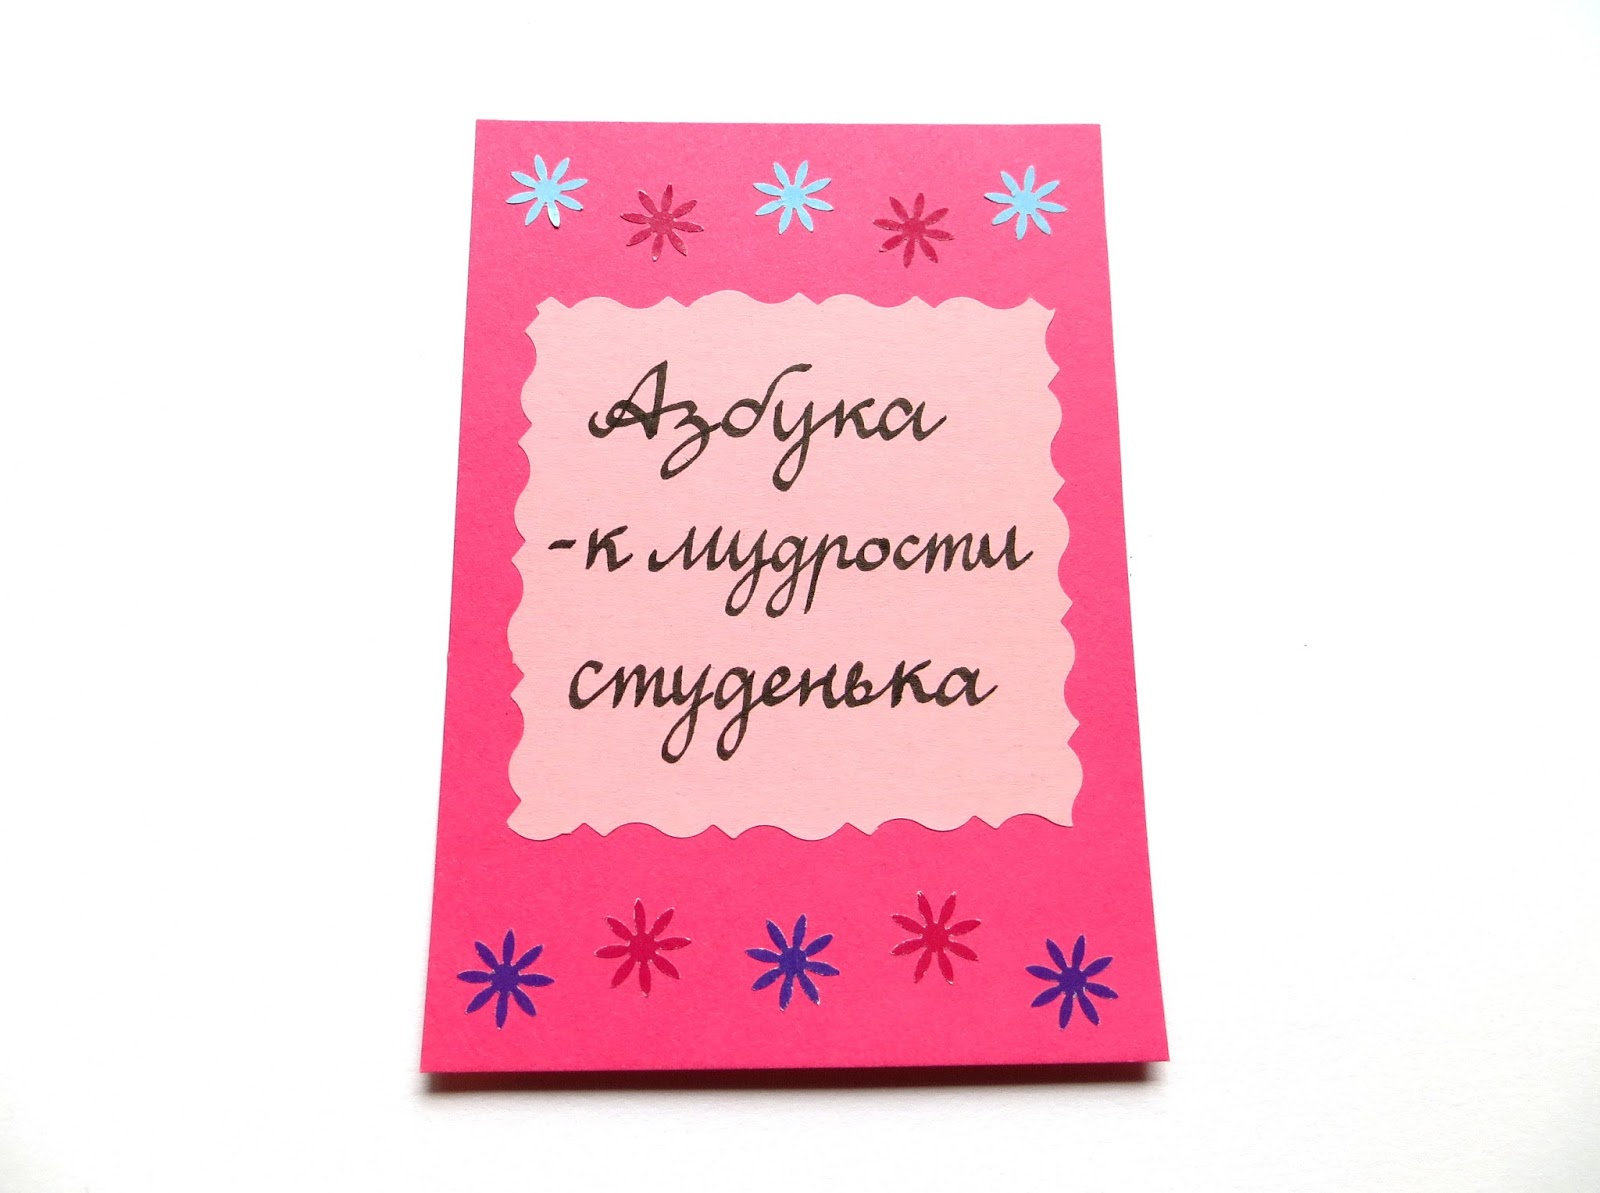 Practising Russian Cursive Writing